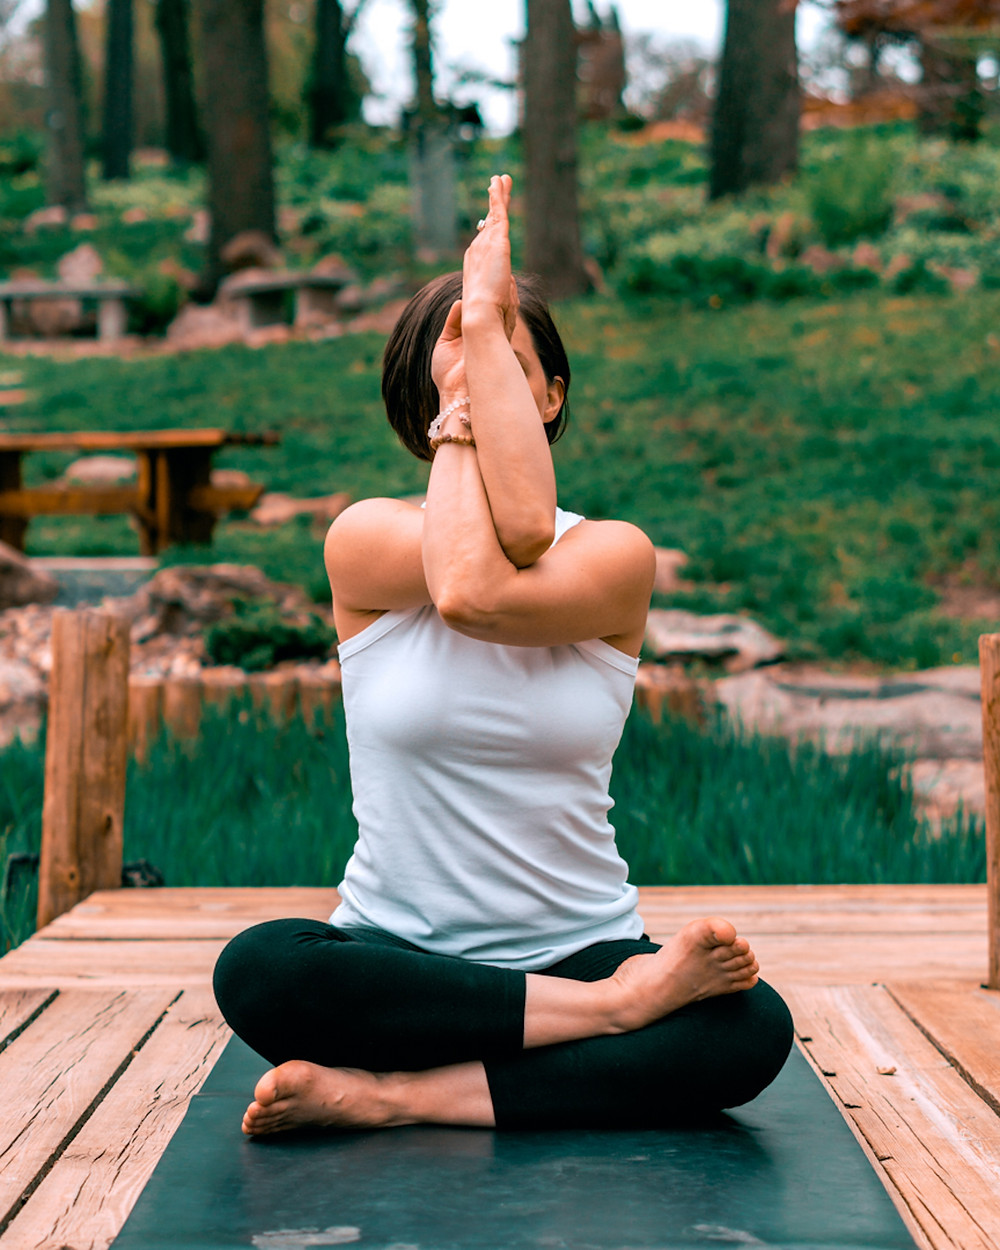 Tibetan Prayer Pose crosses over the energies.